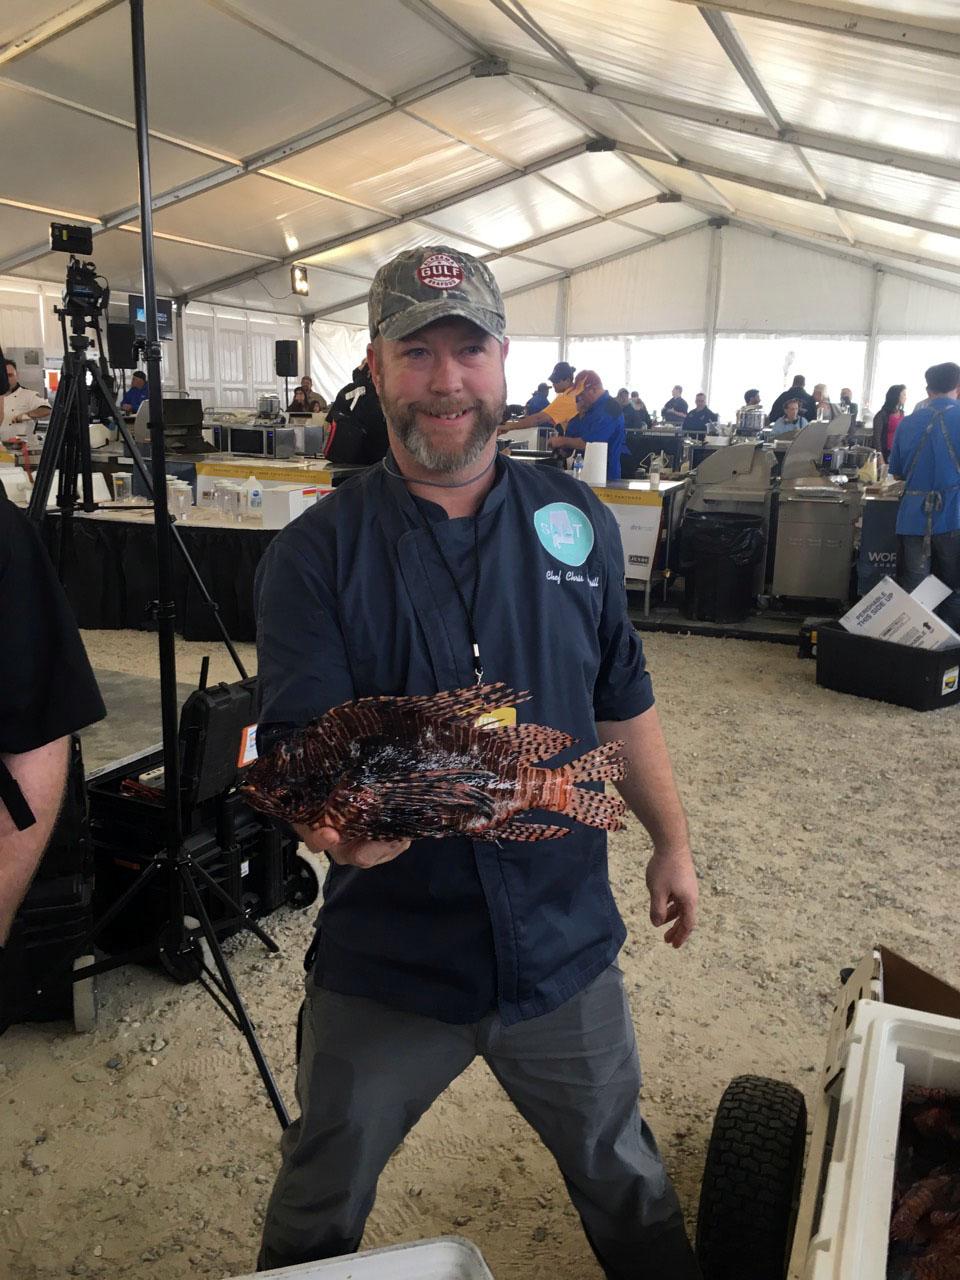 Chris holding a large Lion Fish